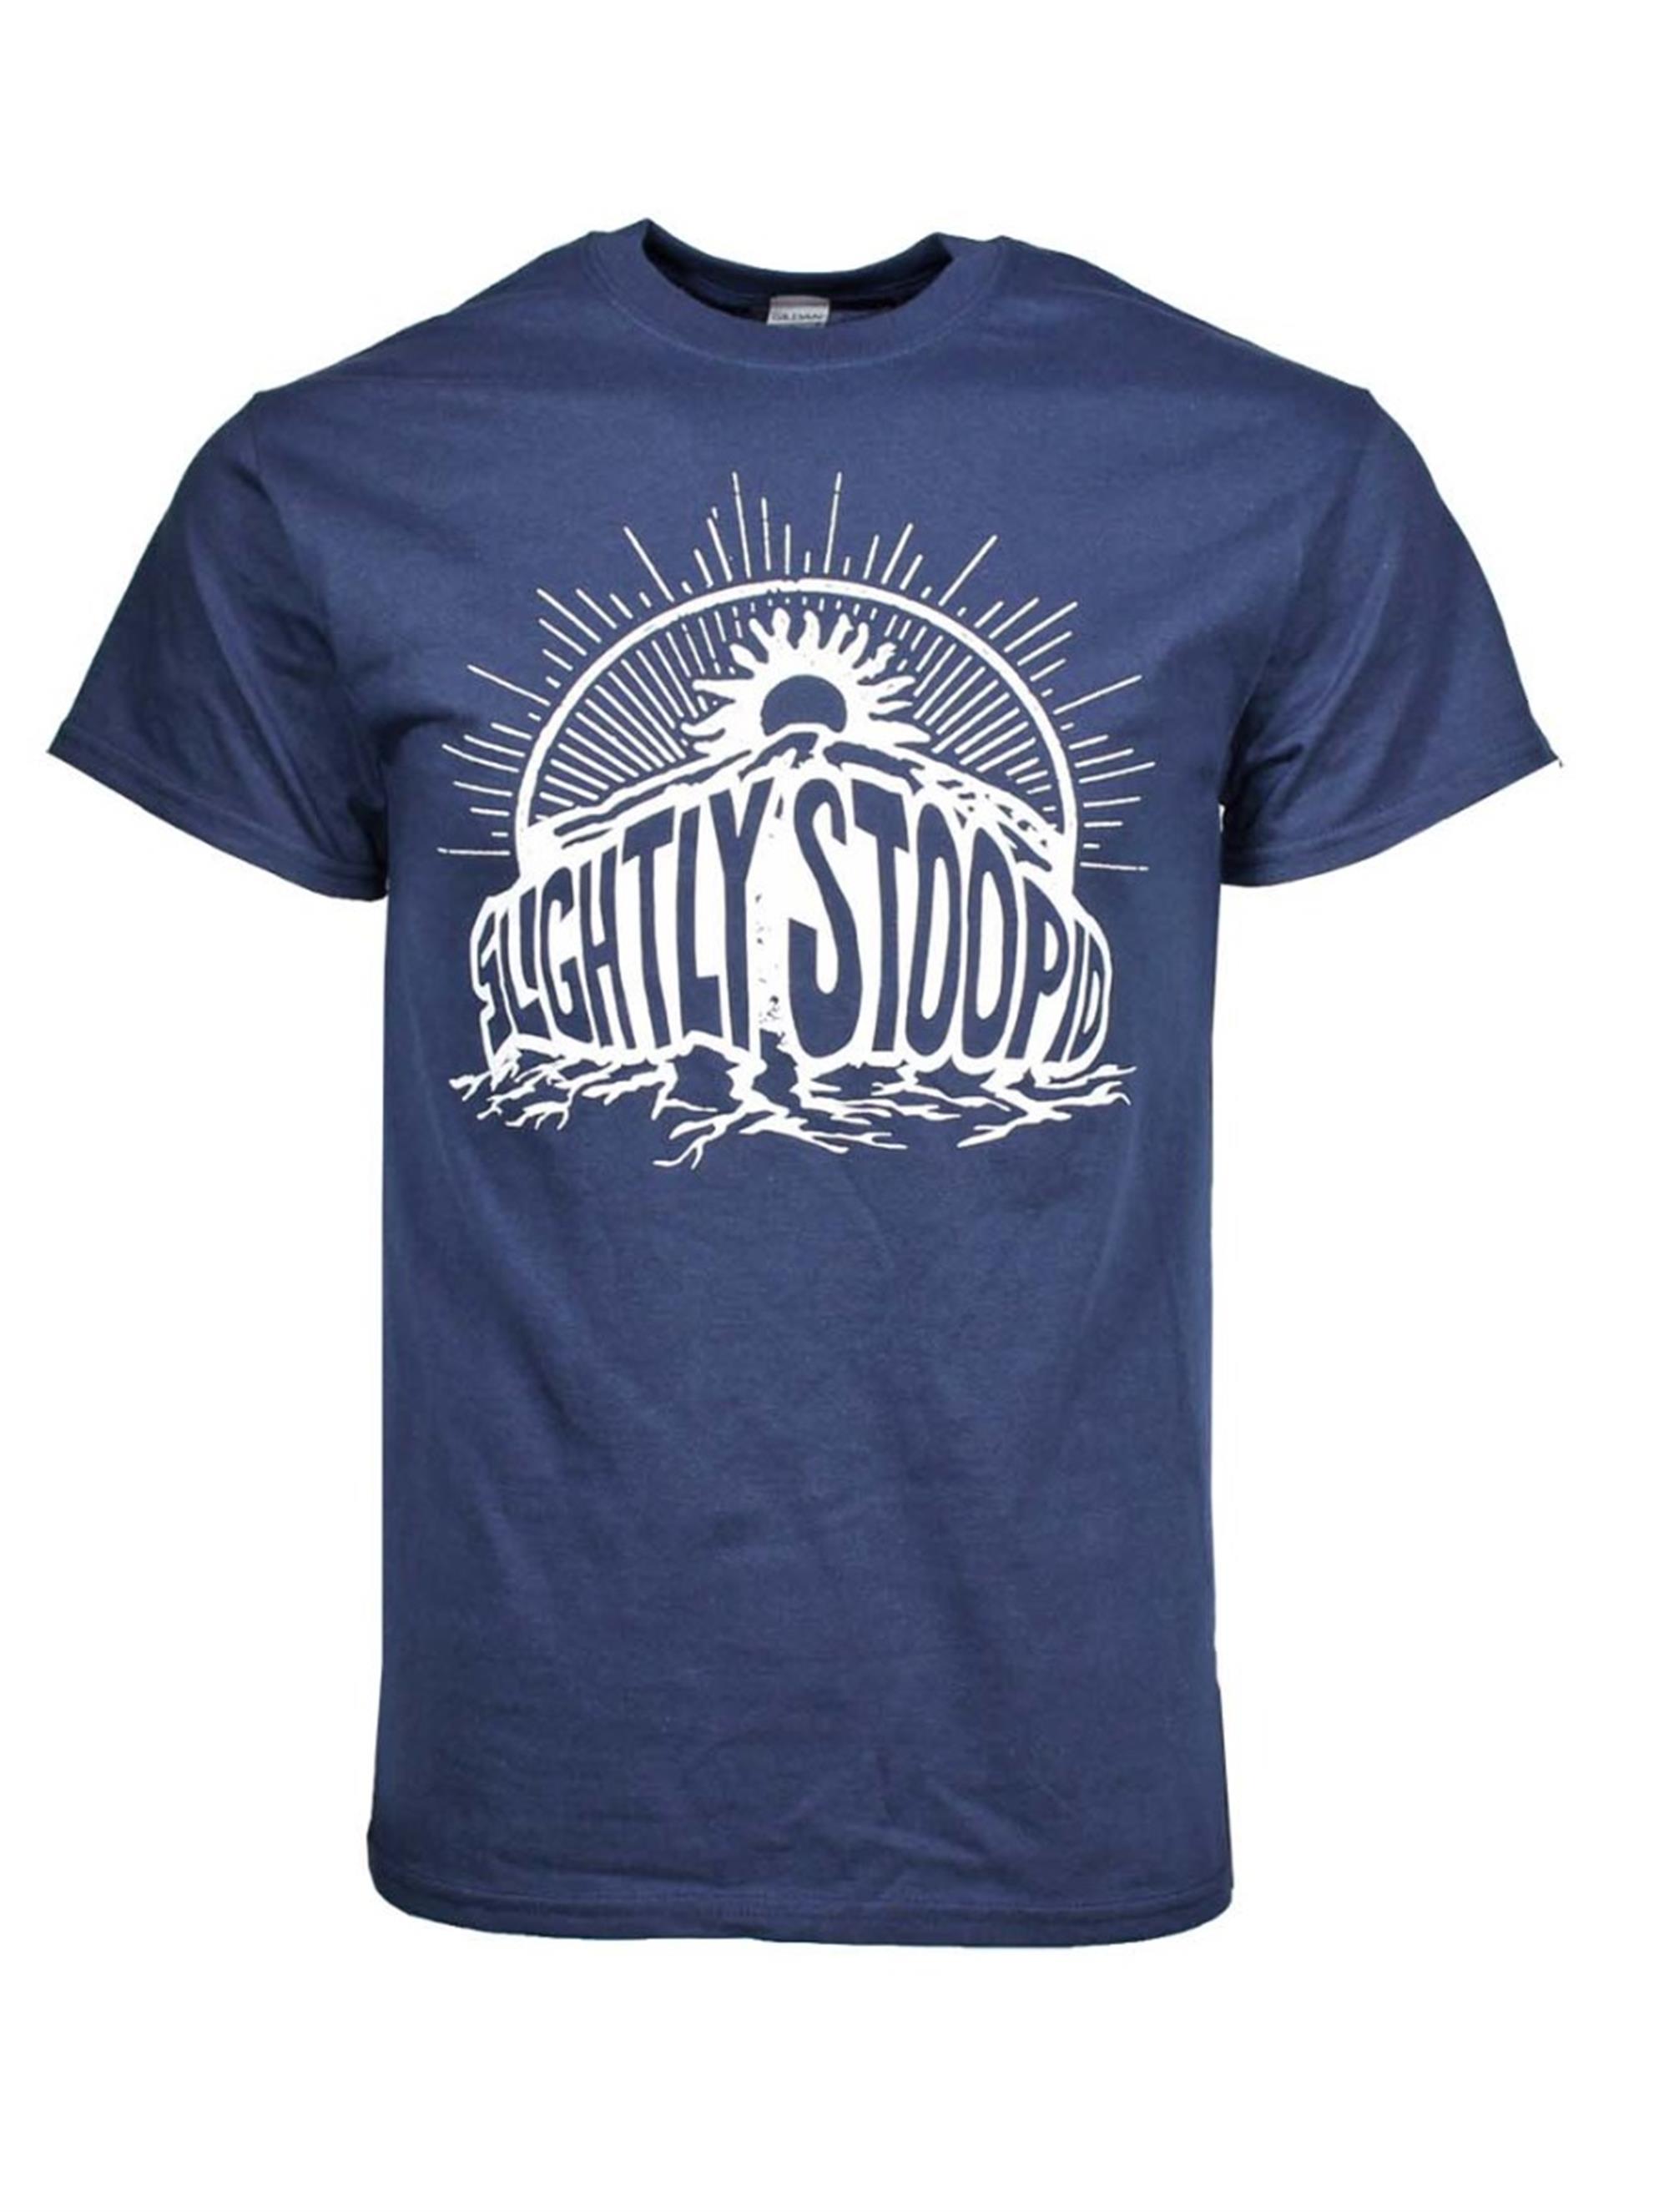 Slightly Stoopid Uprising T-Shirt